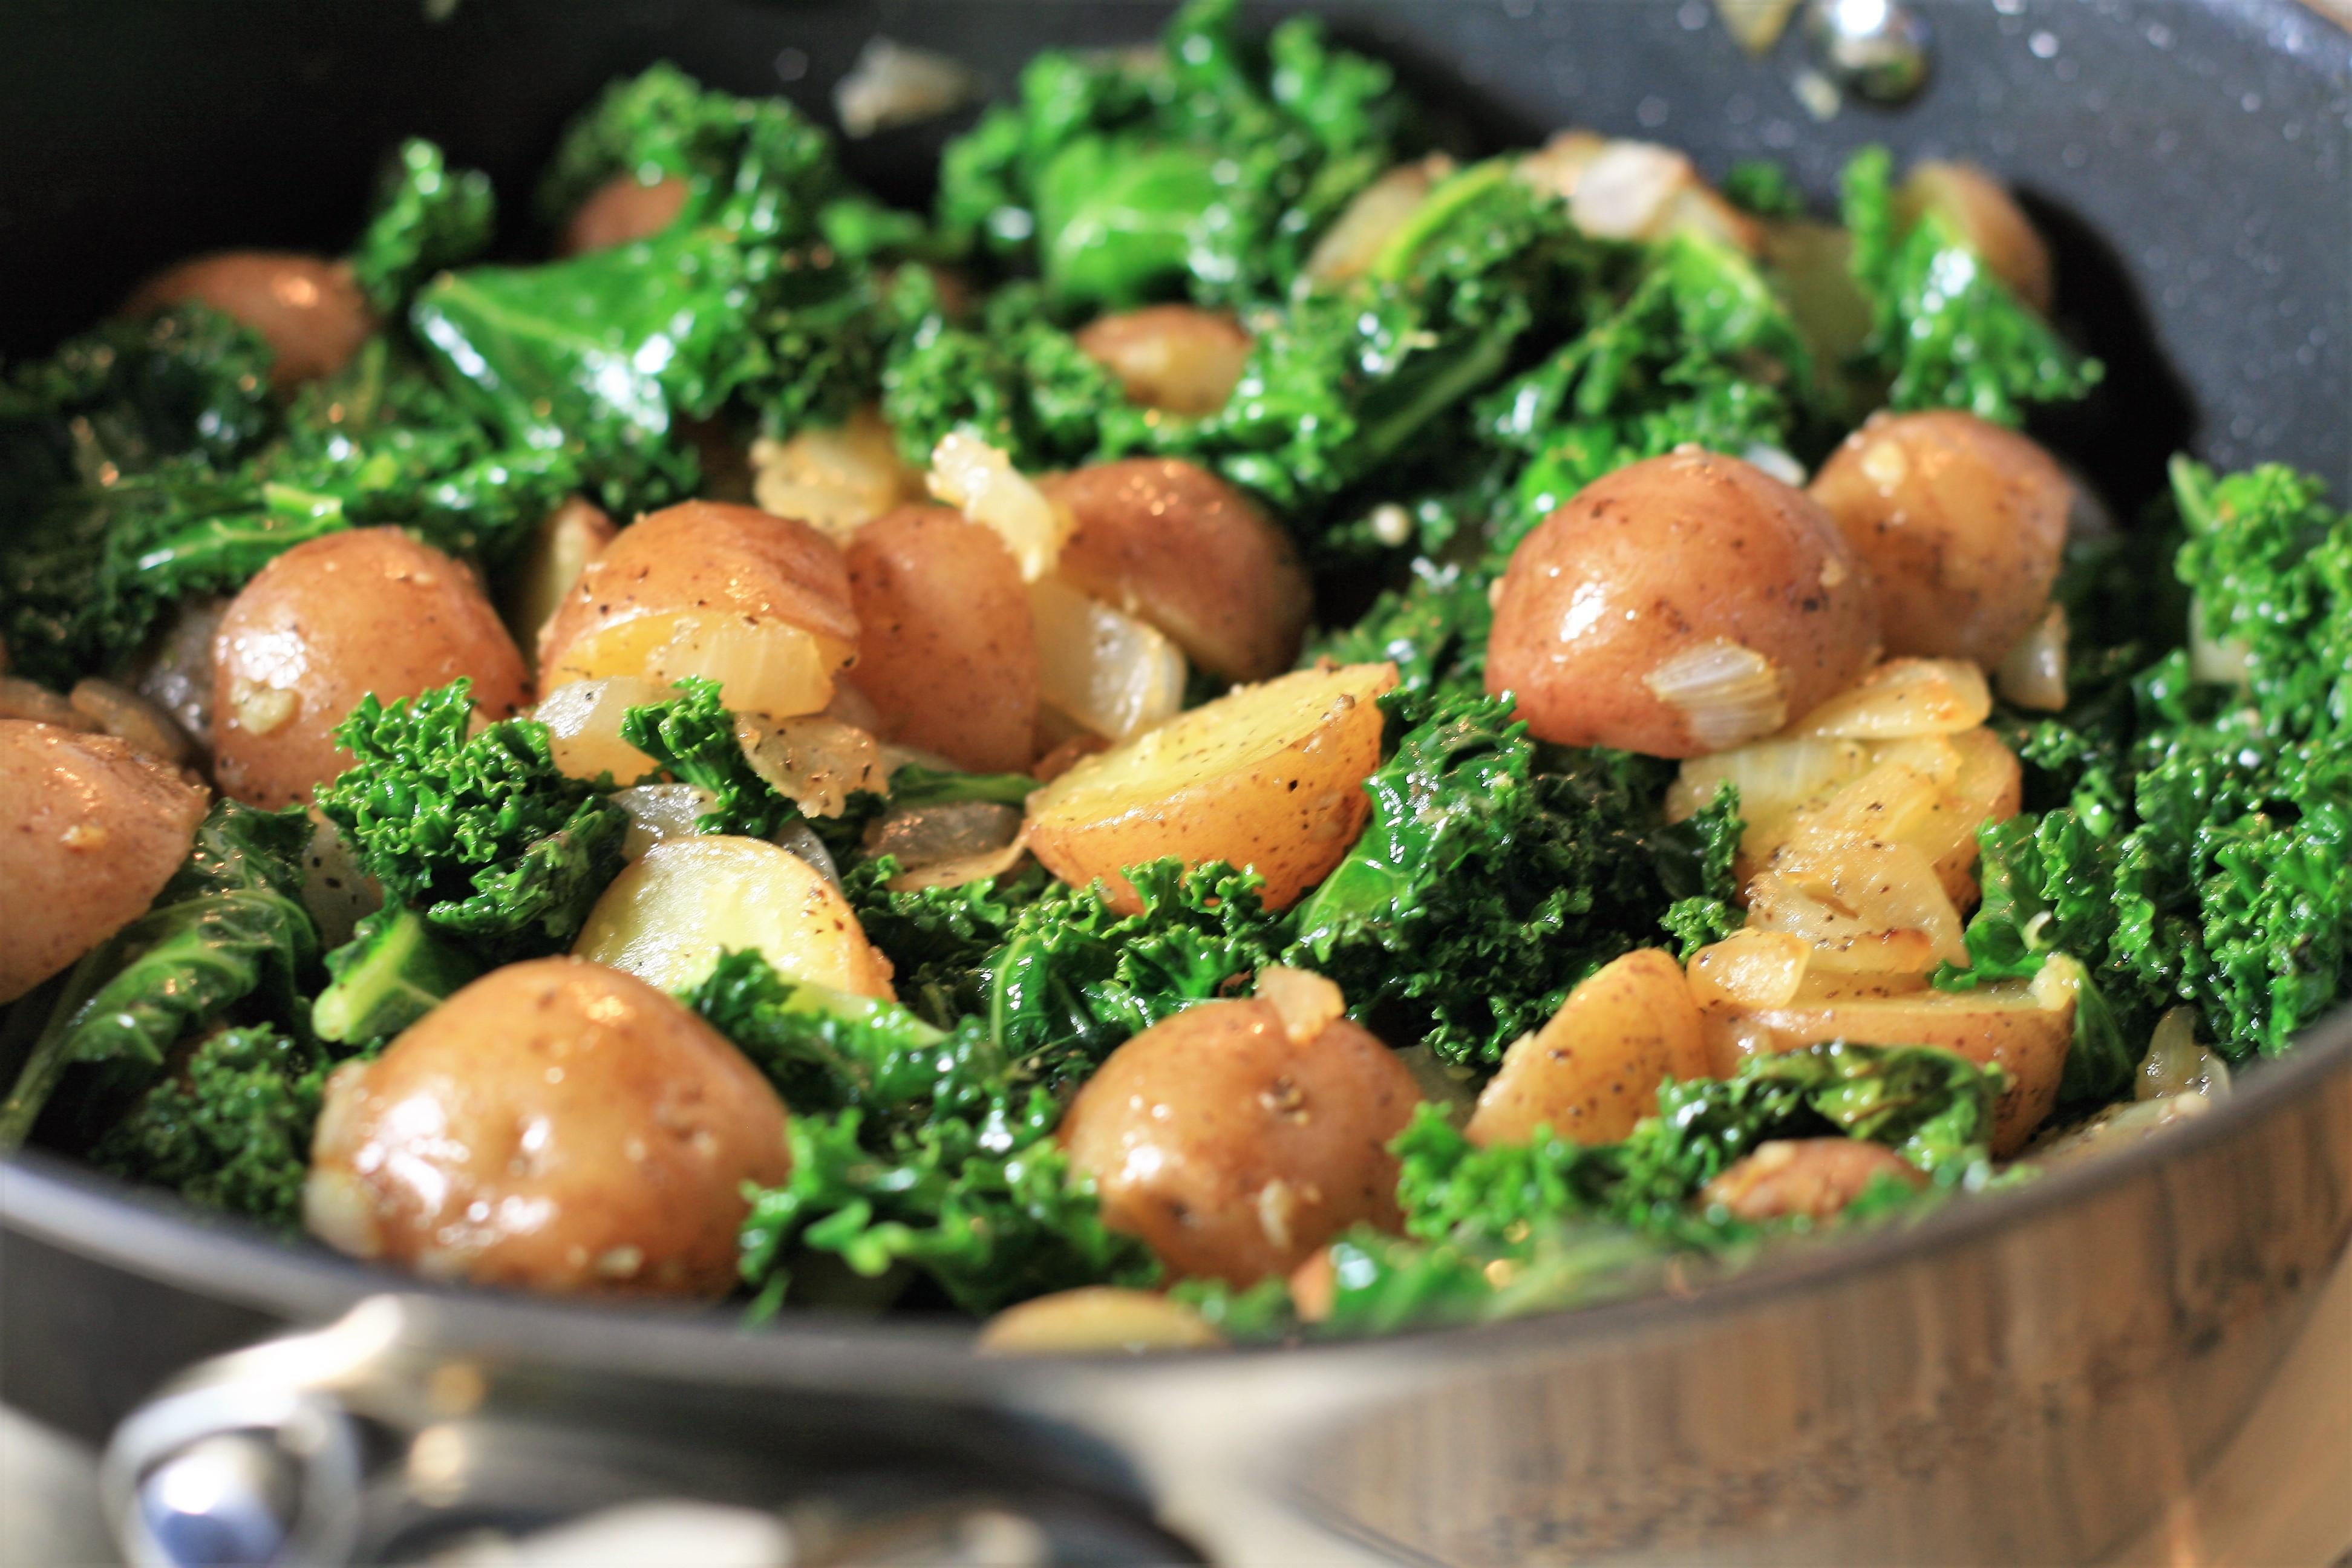 Sauteed Potatoes with Kale